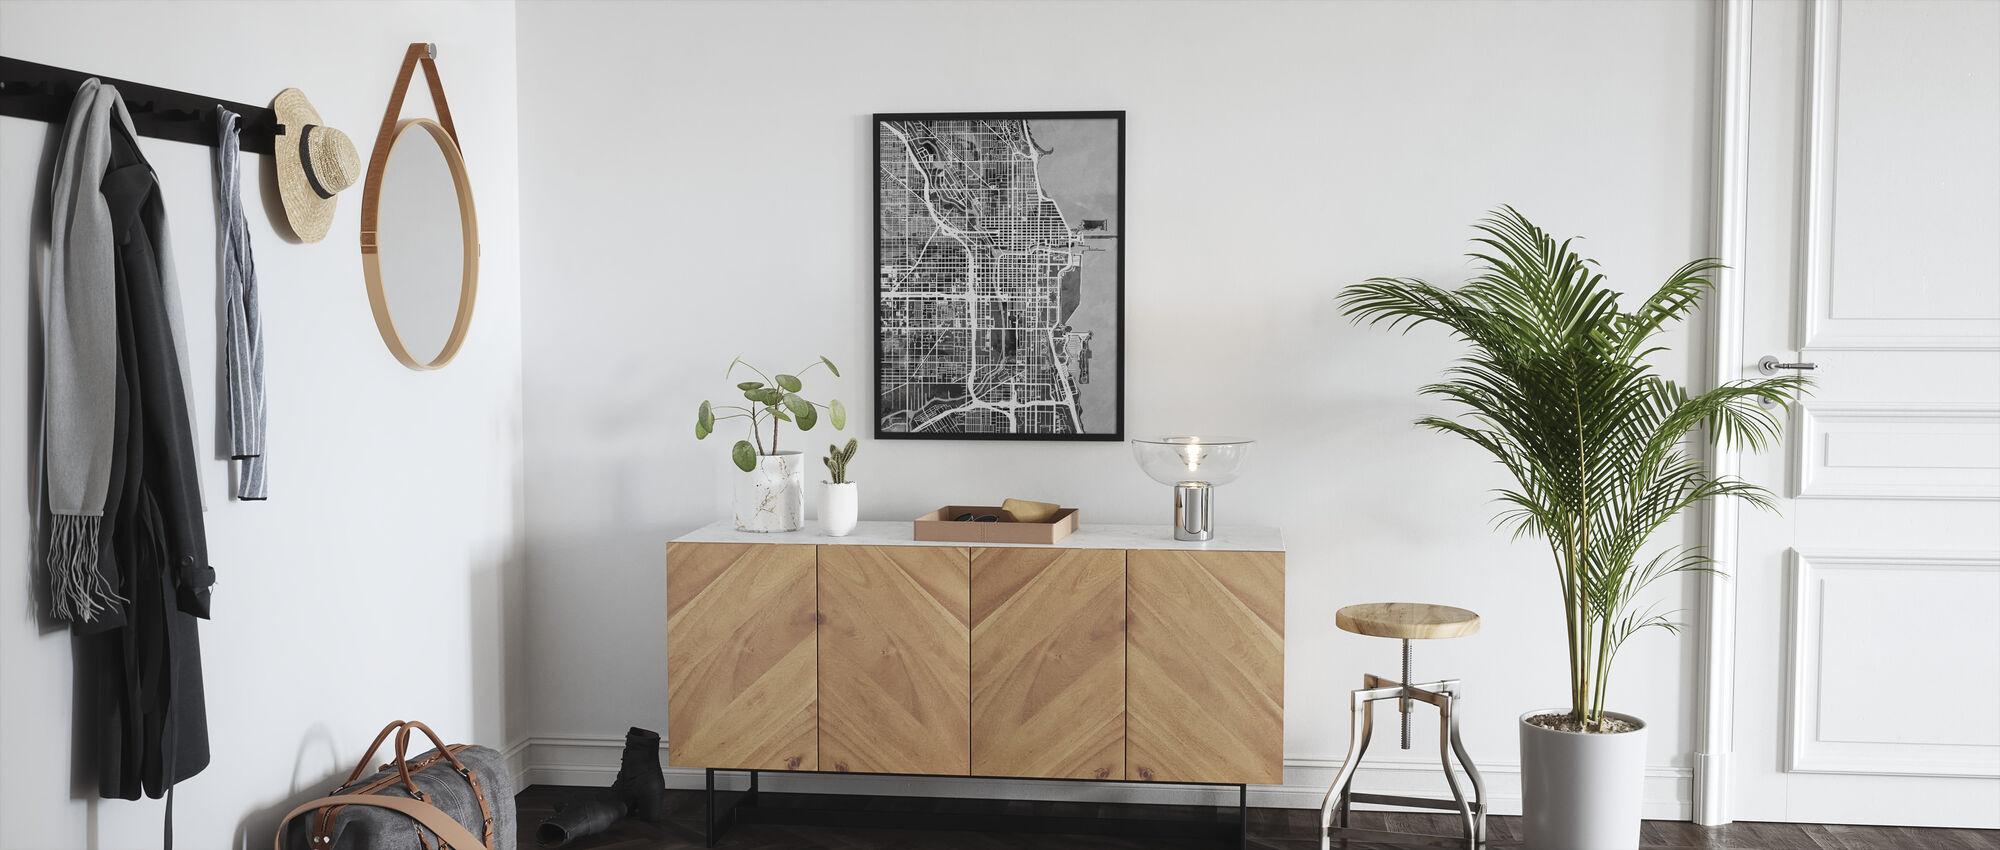 Chicago Street Kartta B/W - Kehystetty kuva - Aula